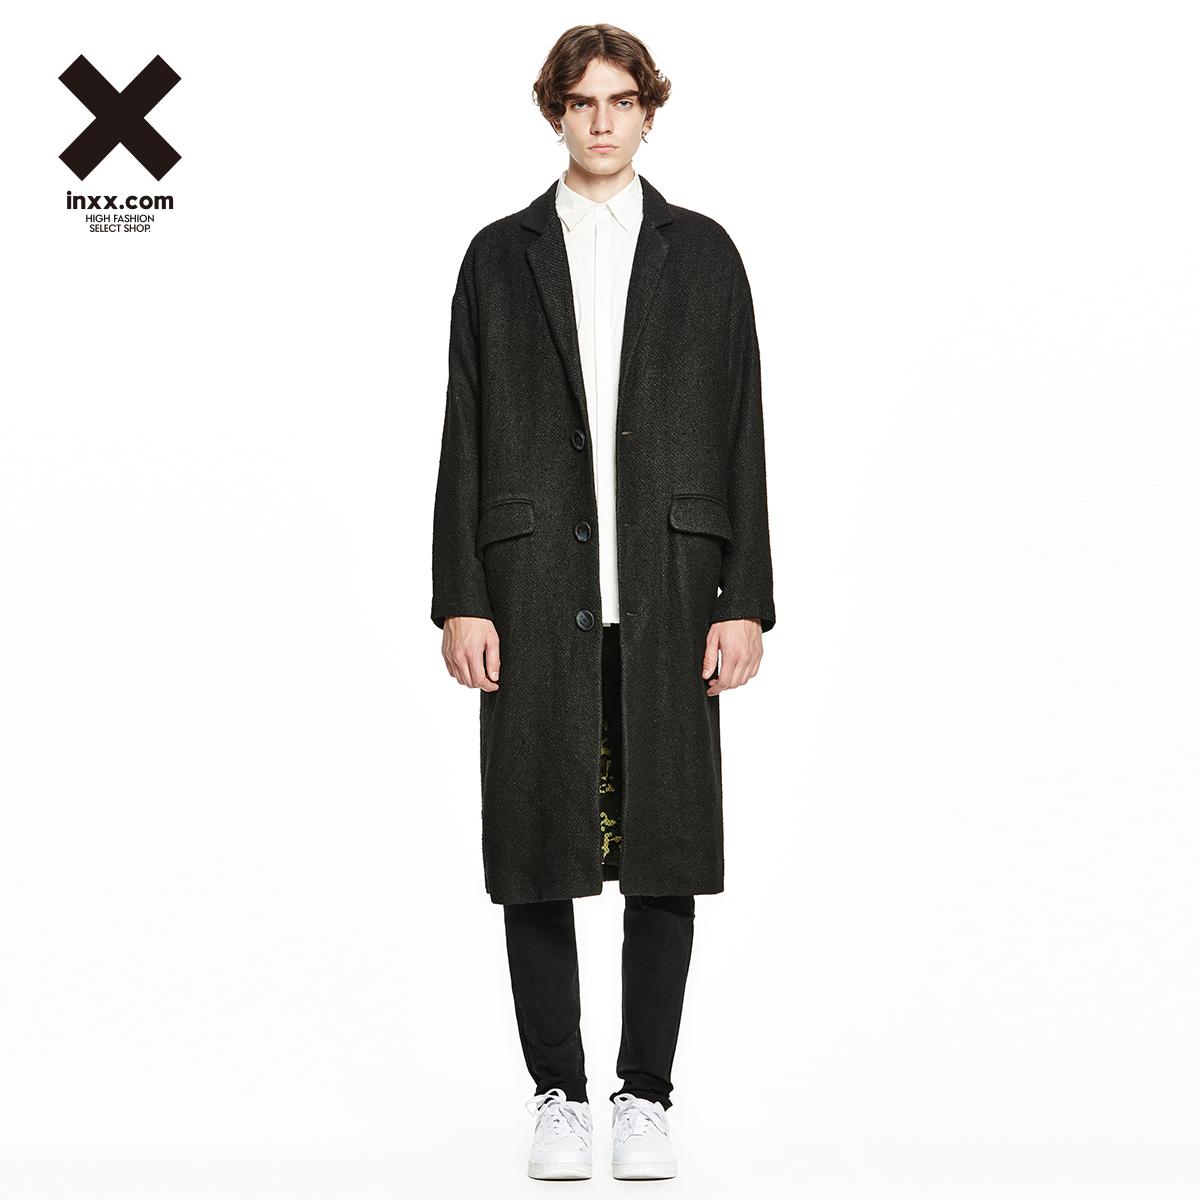 【INXX】Eric Chang原创潮牌长款风衣EC53209209